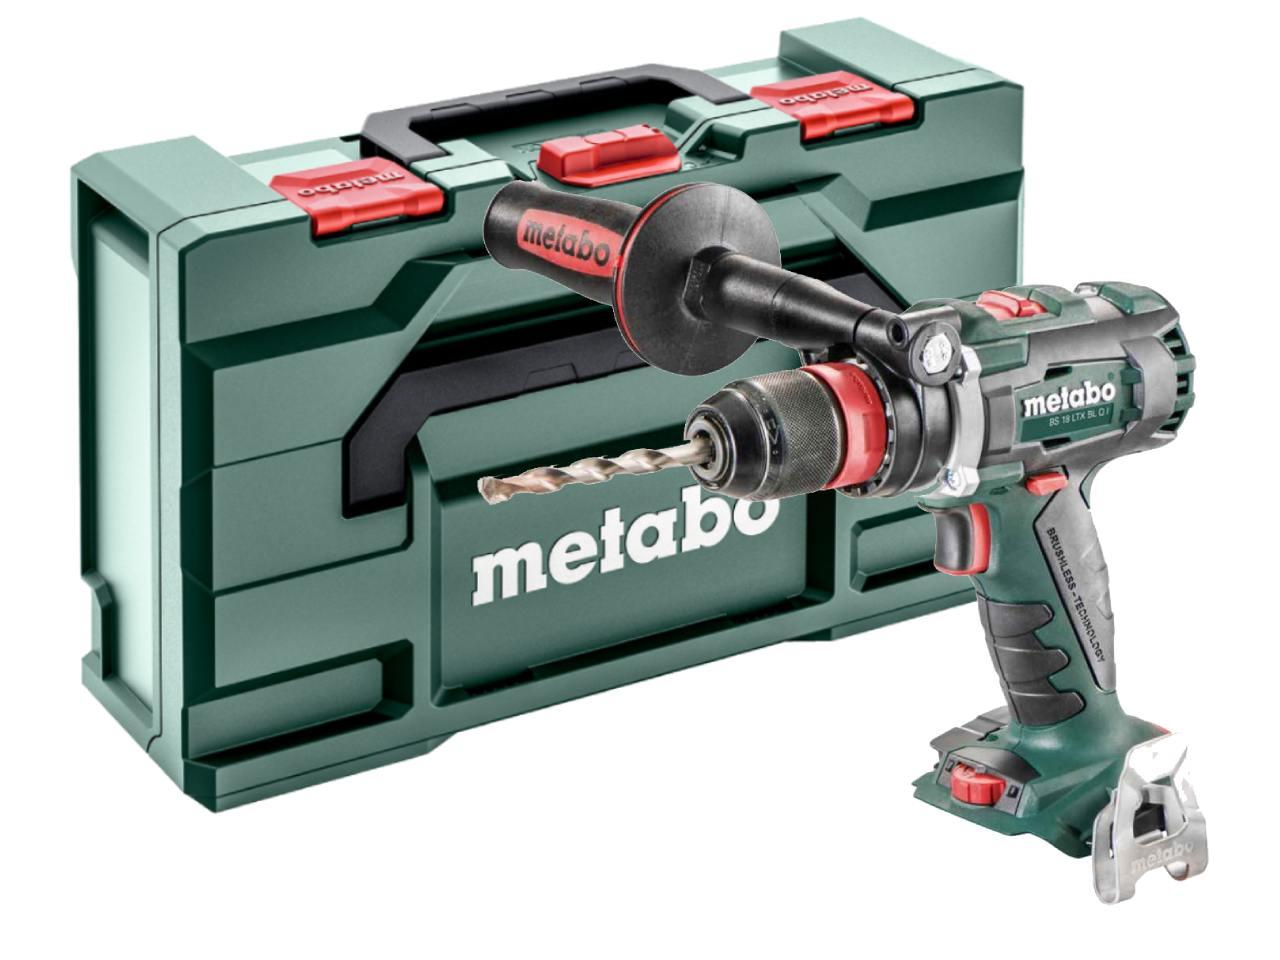 metabo bs18ltx 18v quick drill driver 2 x li ion. Black Bedroom Furniture Sets. Home Design Ideas